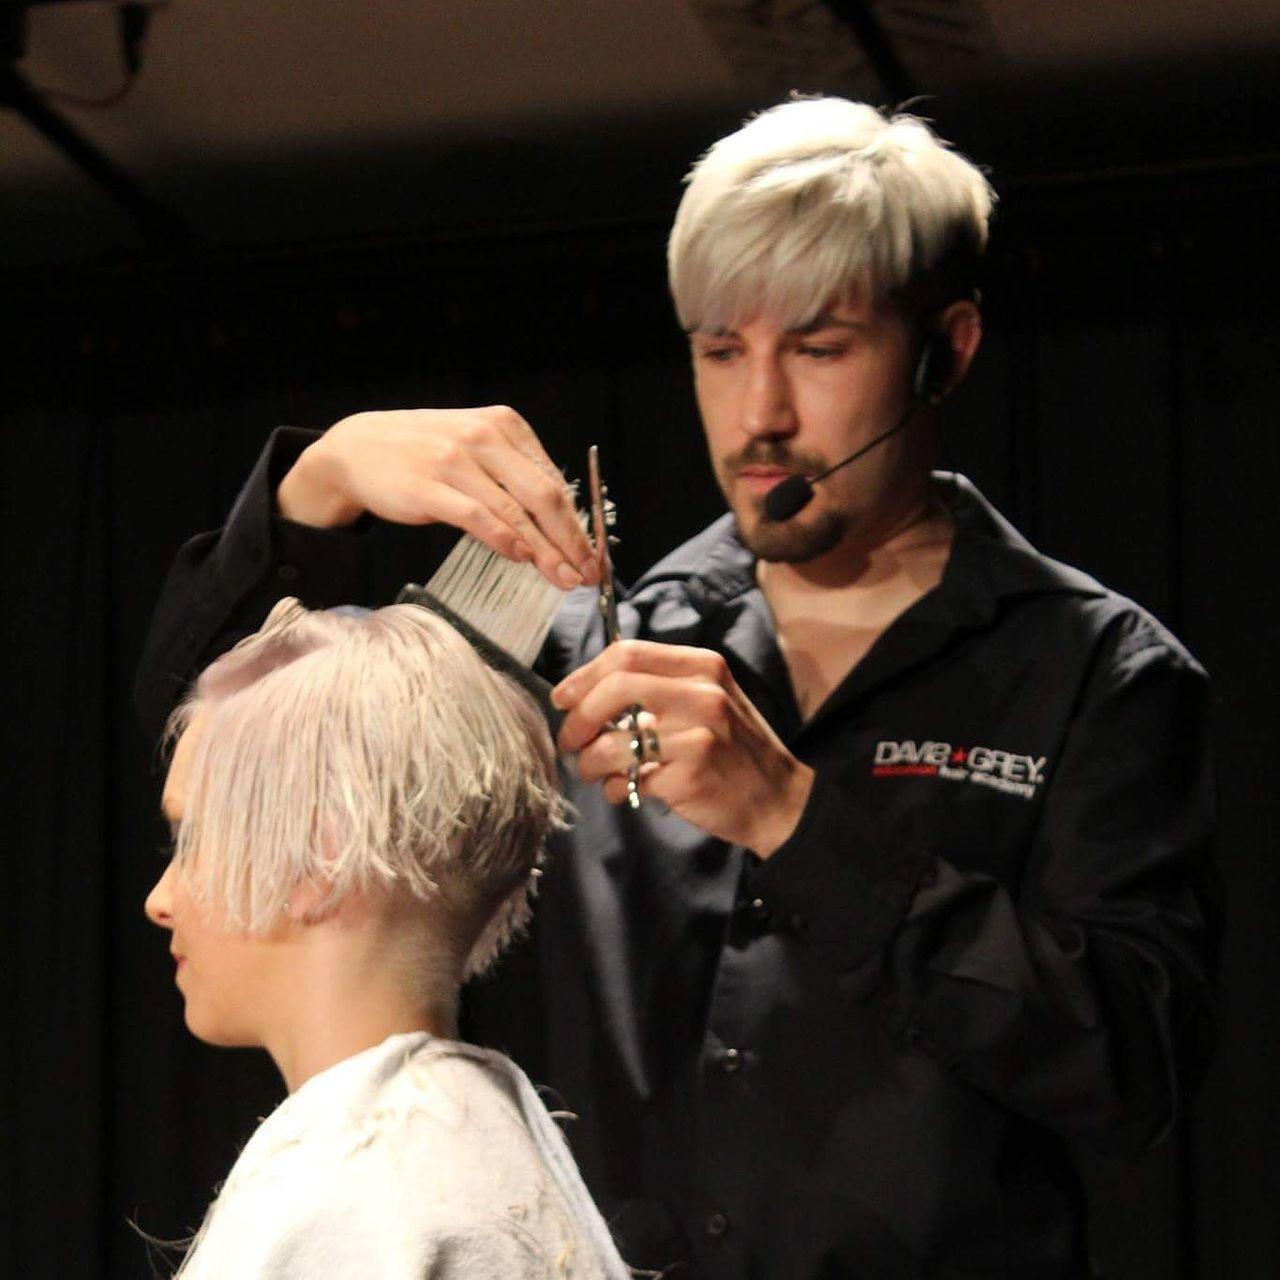 Hairdresser Blond Hair Cutting Haircut Cutting Hair Hair Hairstyle Haircolor Hairdressing Haircolour Hairtrends Hair Salon Education Educator Working